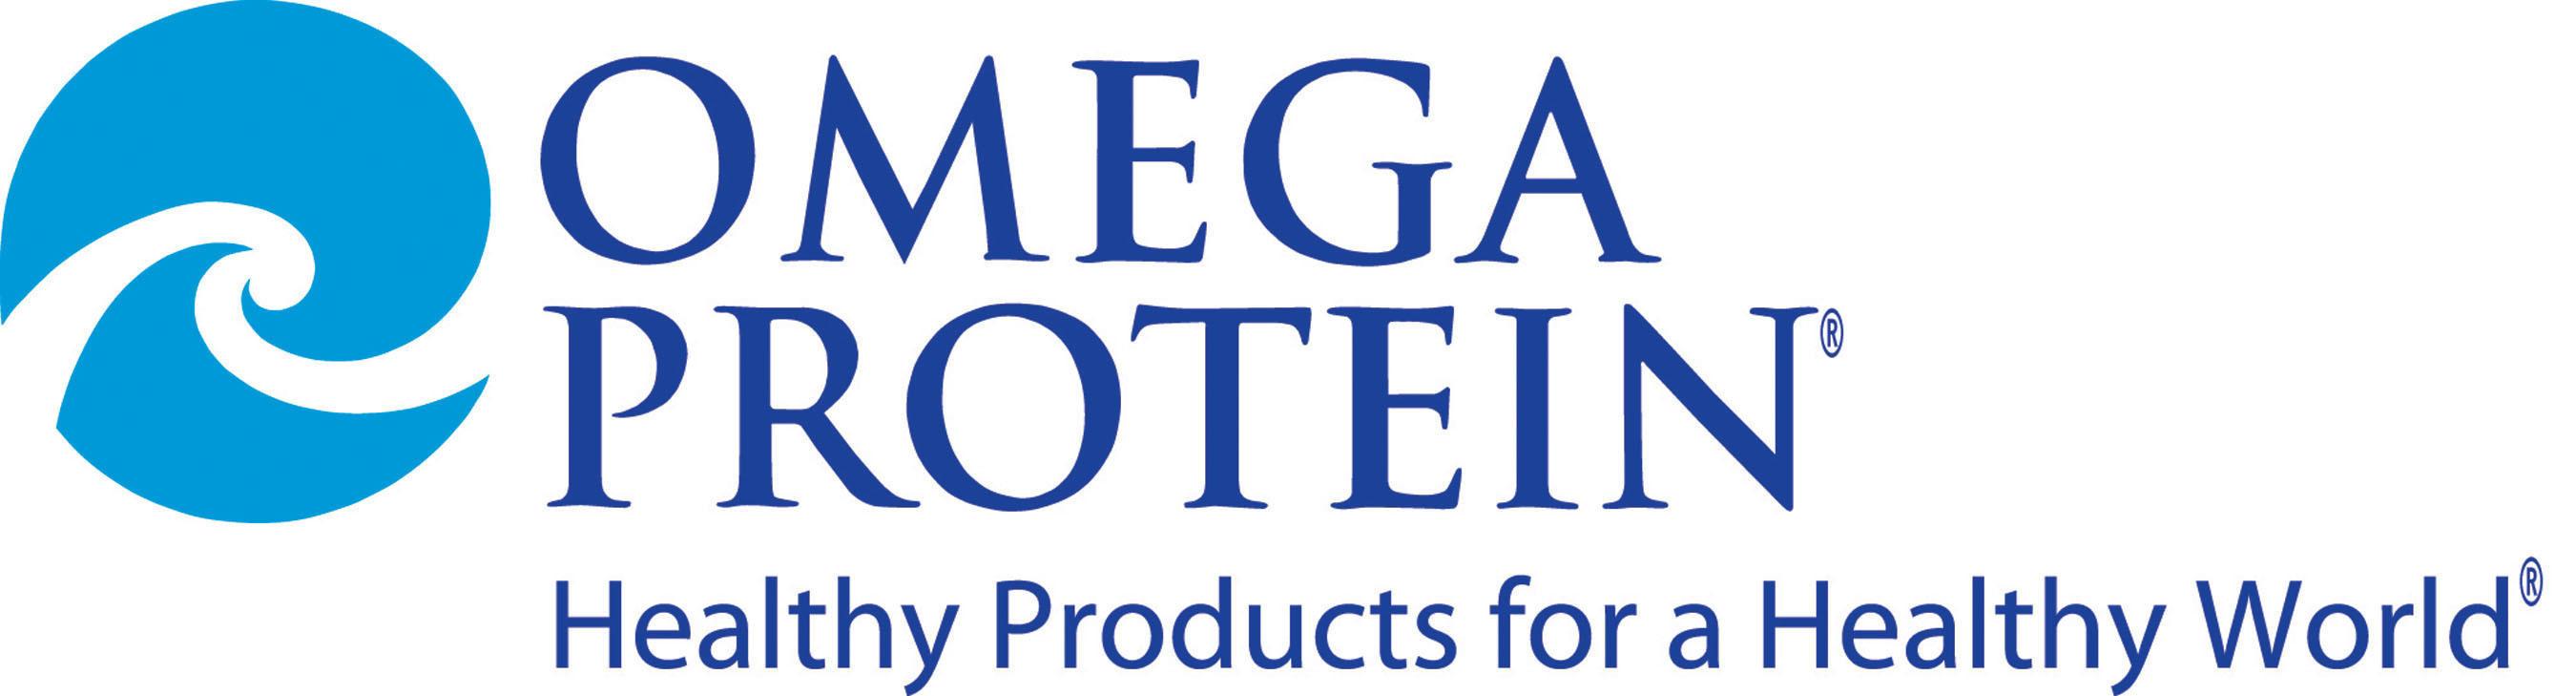 Omega Protein Corporation Logo.